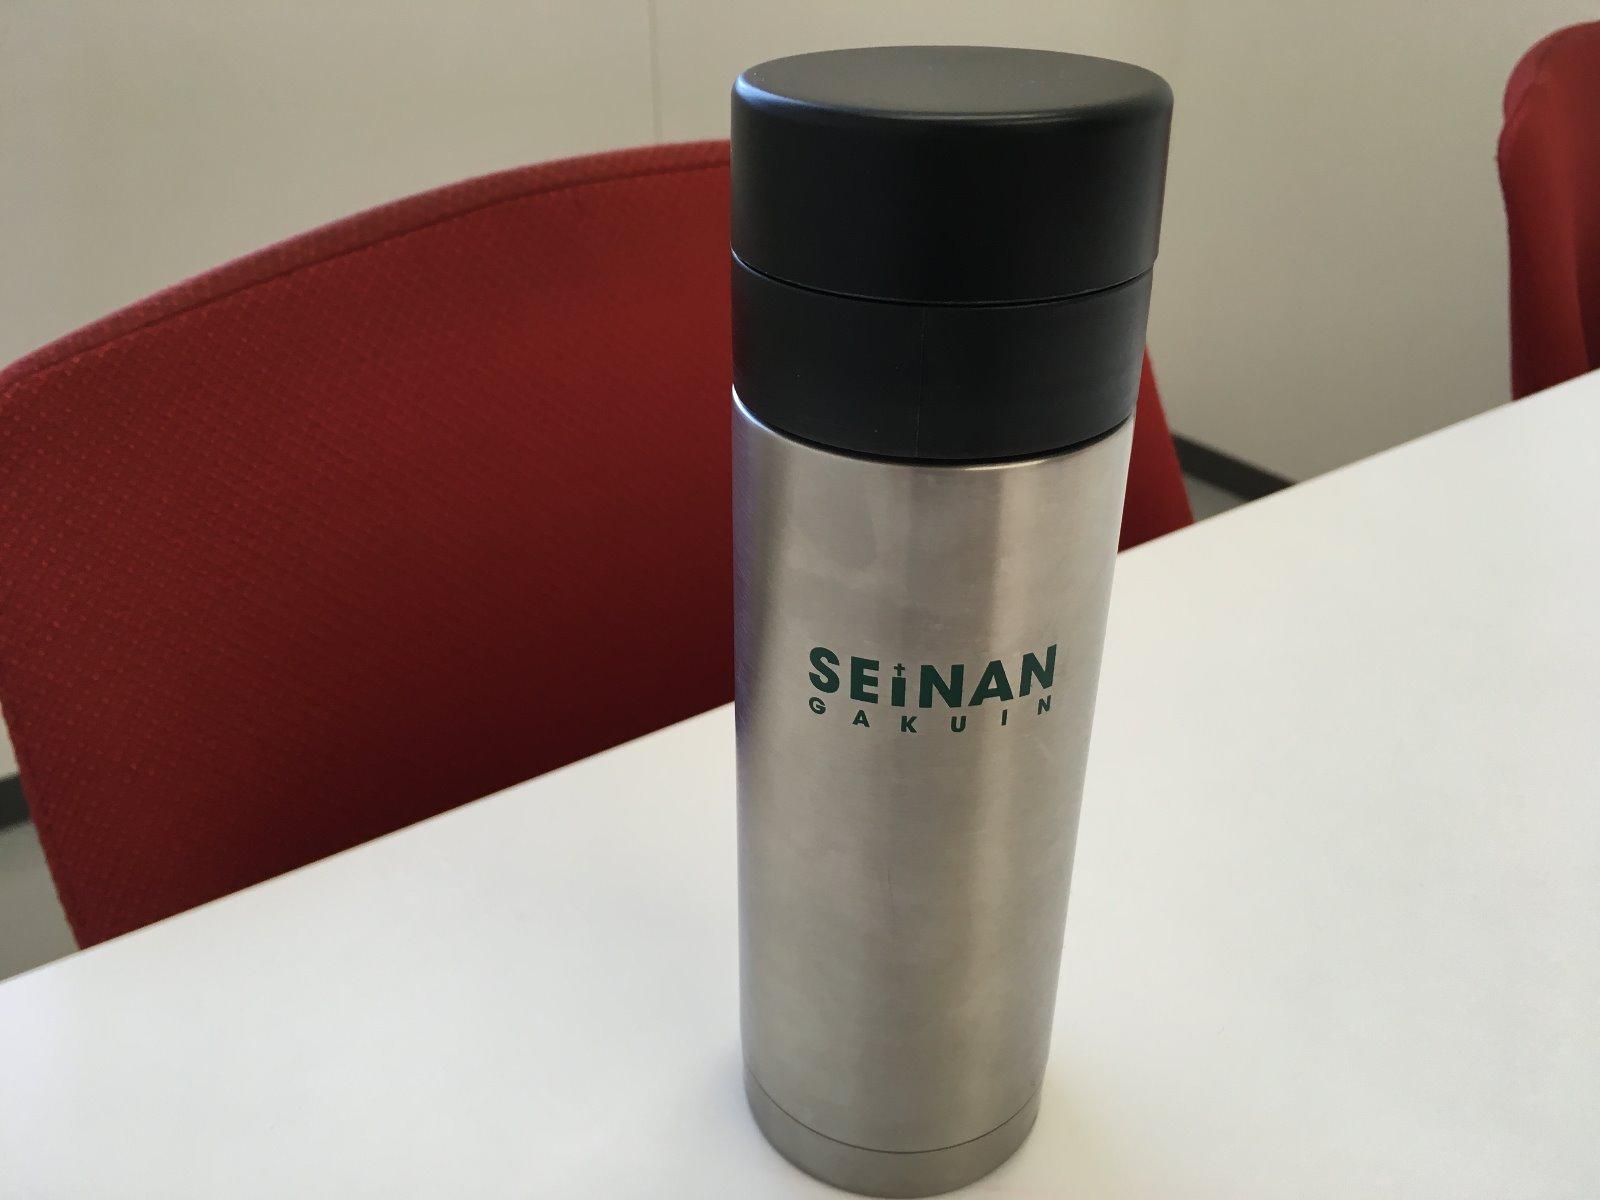 https://www.cs-seinan.co.jp/userfiles/ステンレスボトル